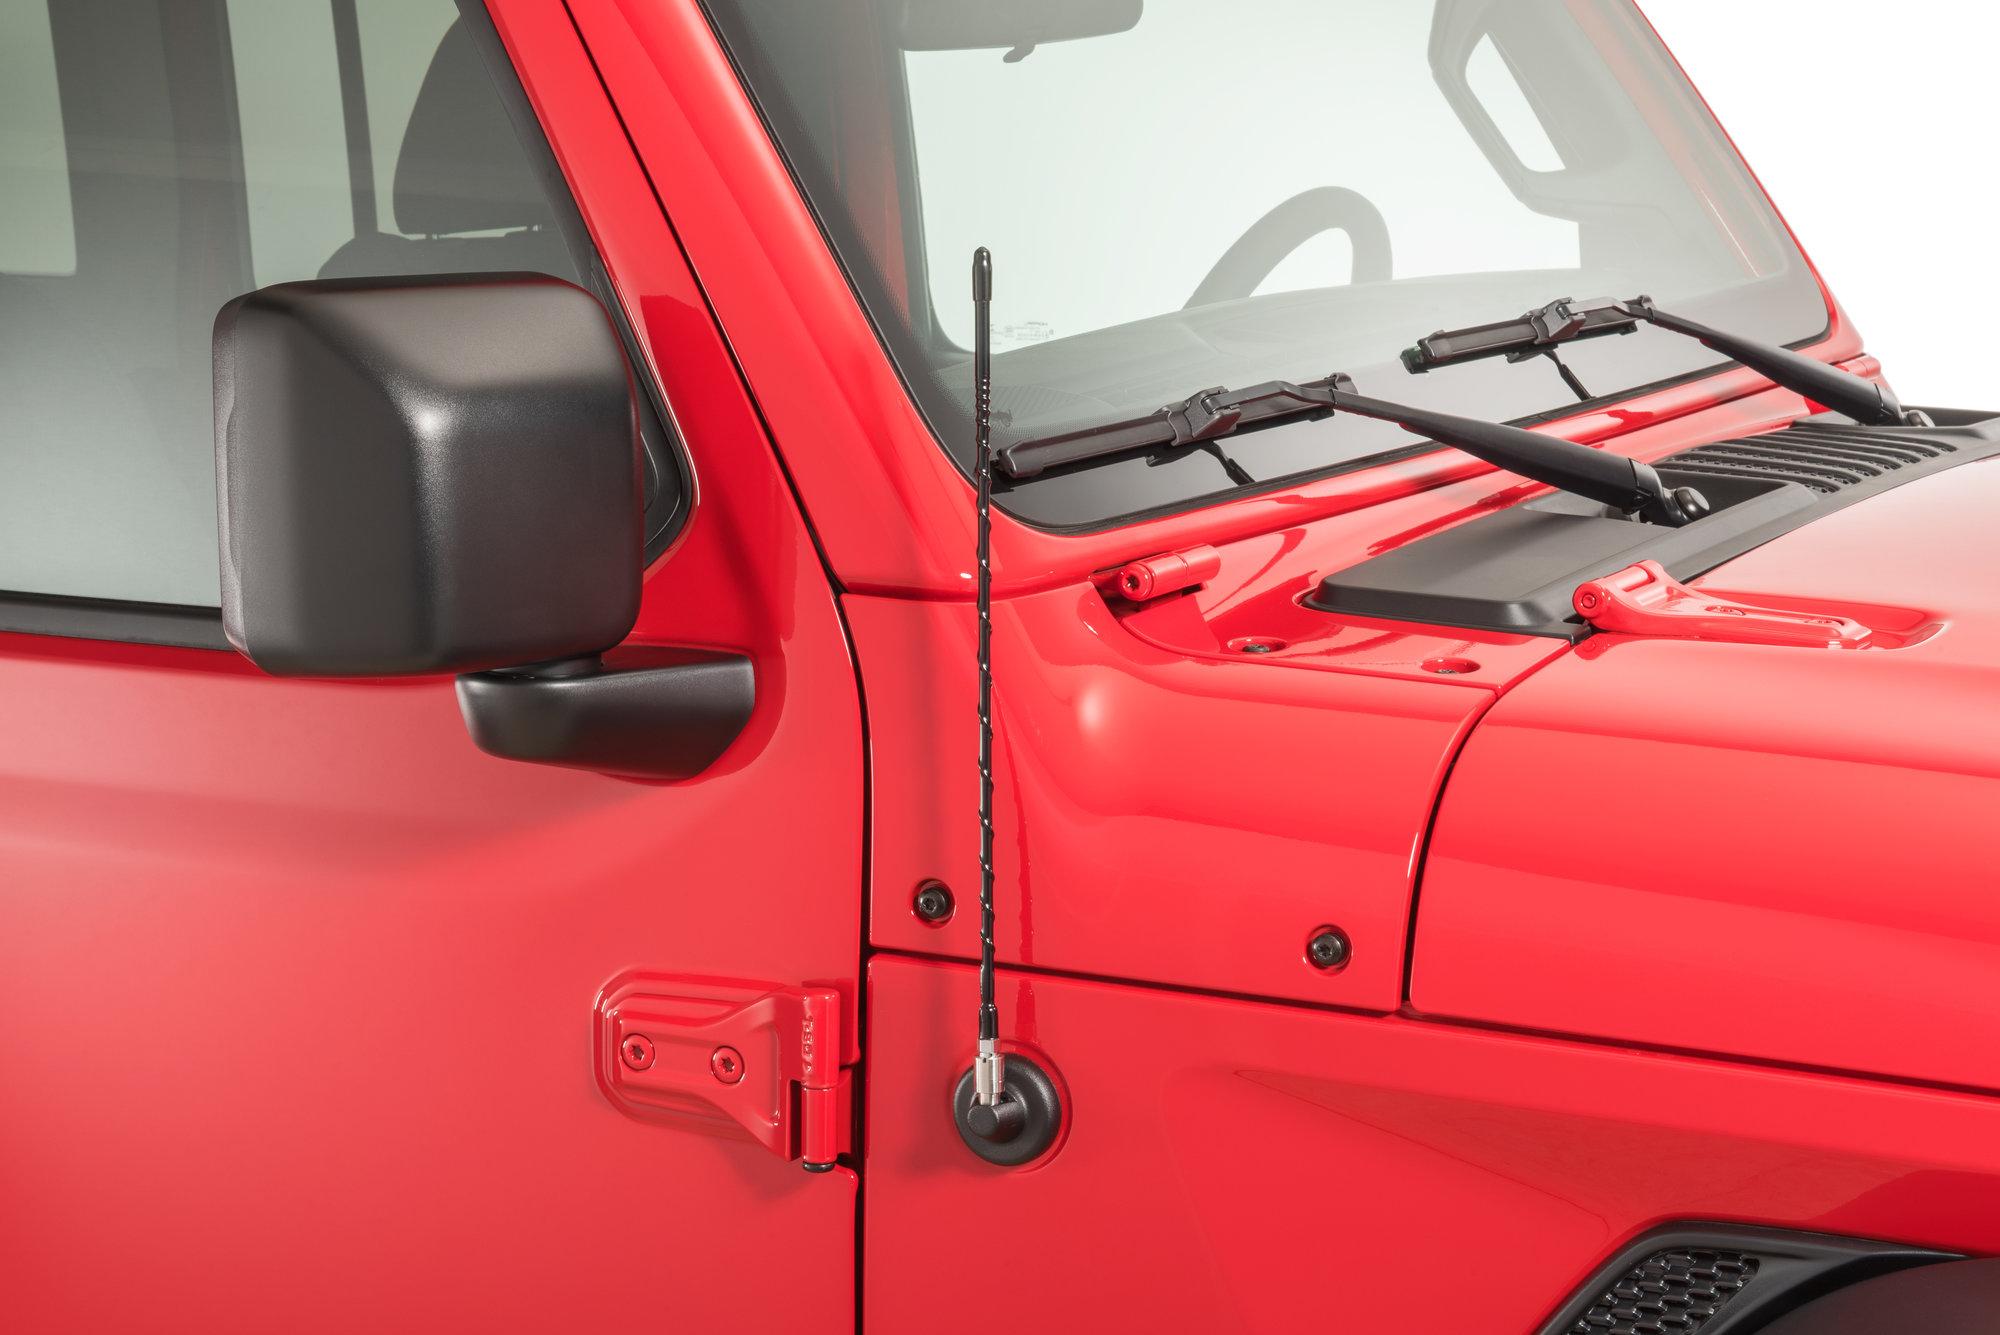 hight resolution of quadratec 16 hi performance am fm stubby antenna for 07 19 jeep wrangler jk jl quadratec